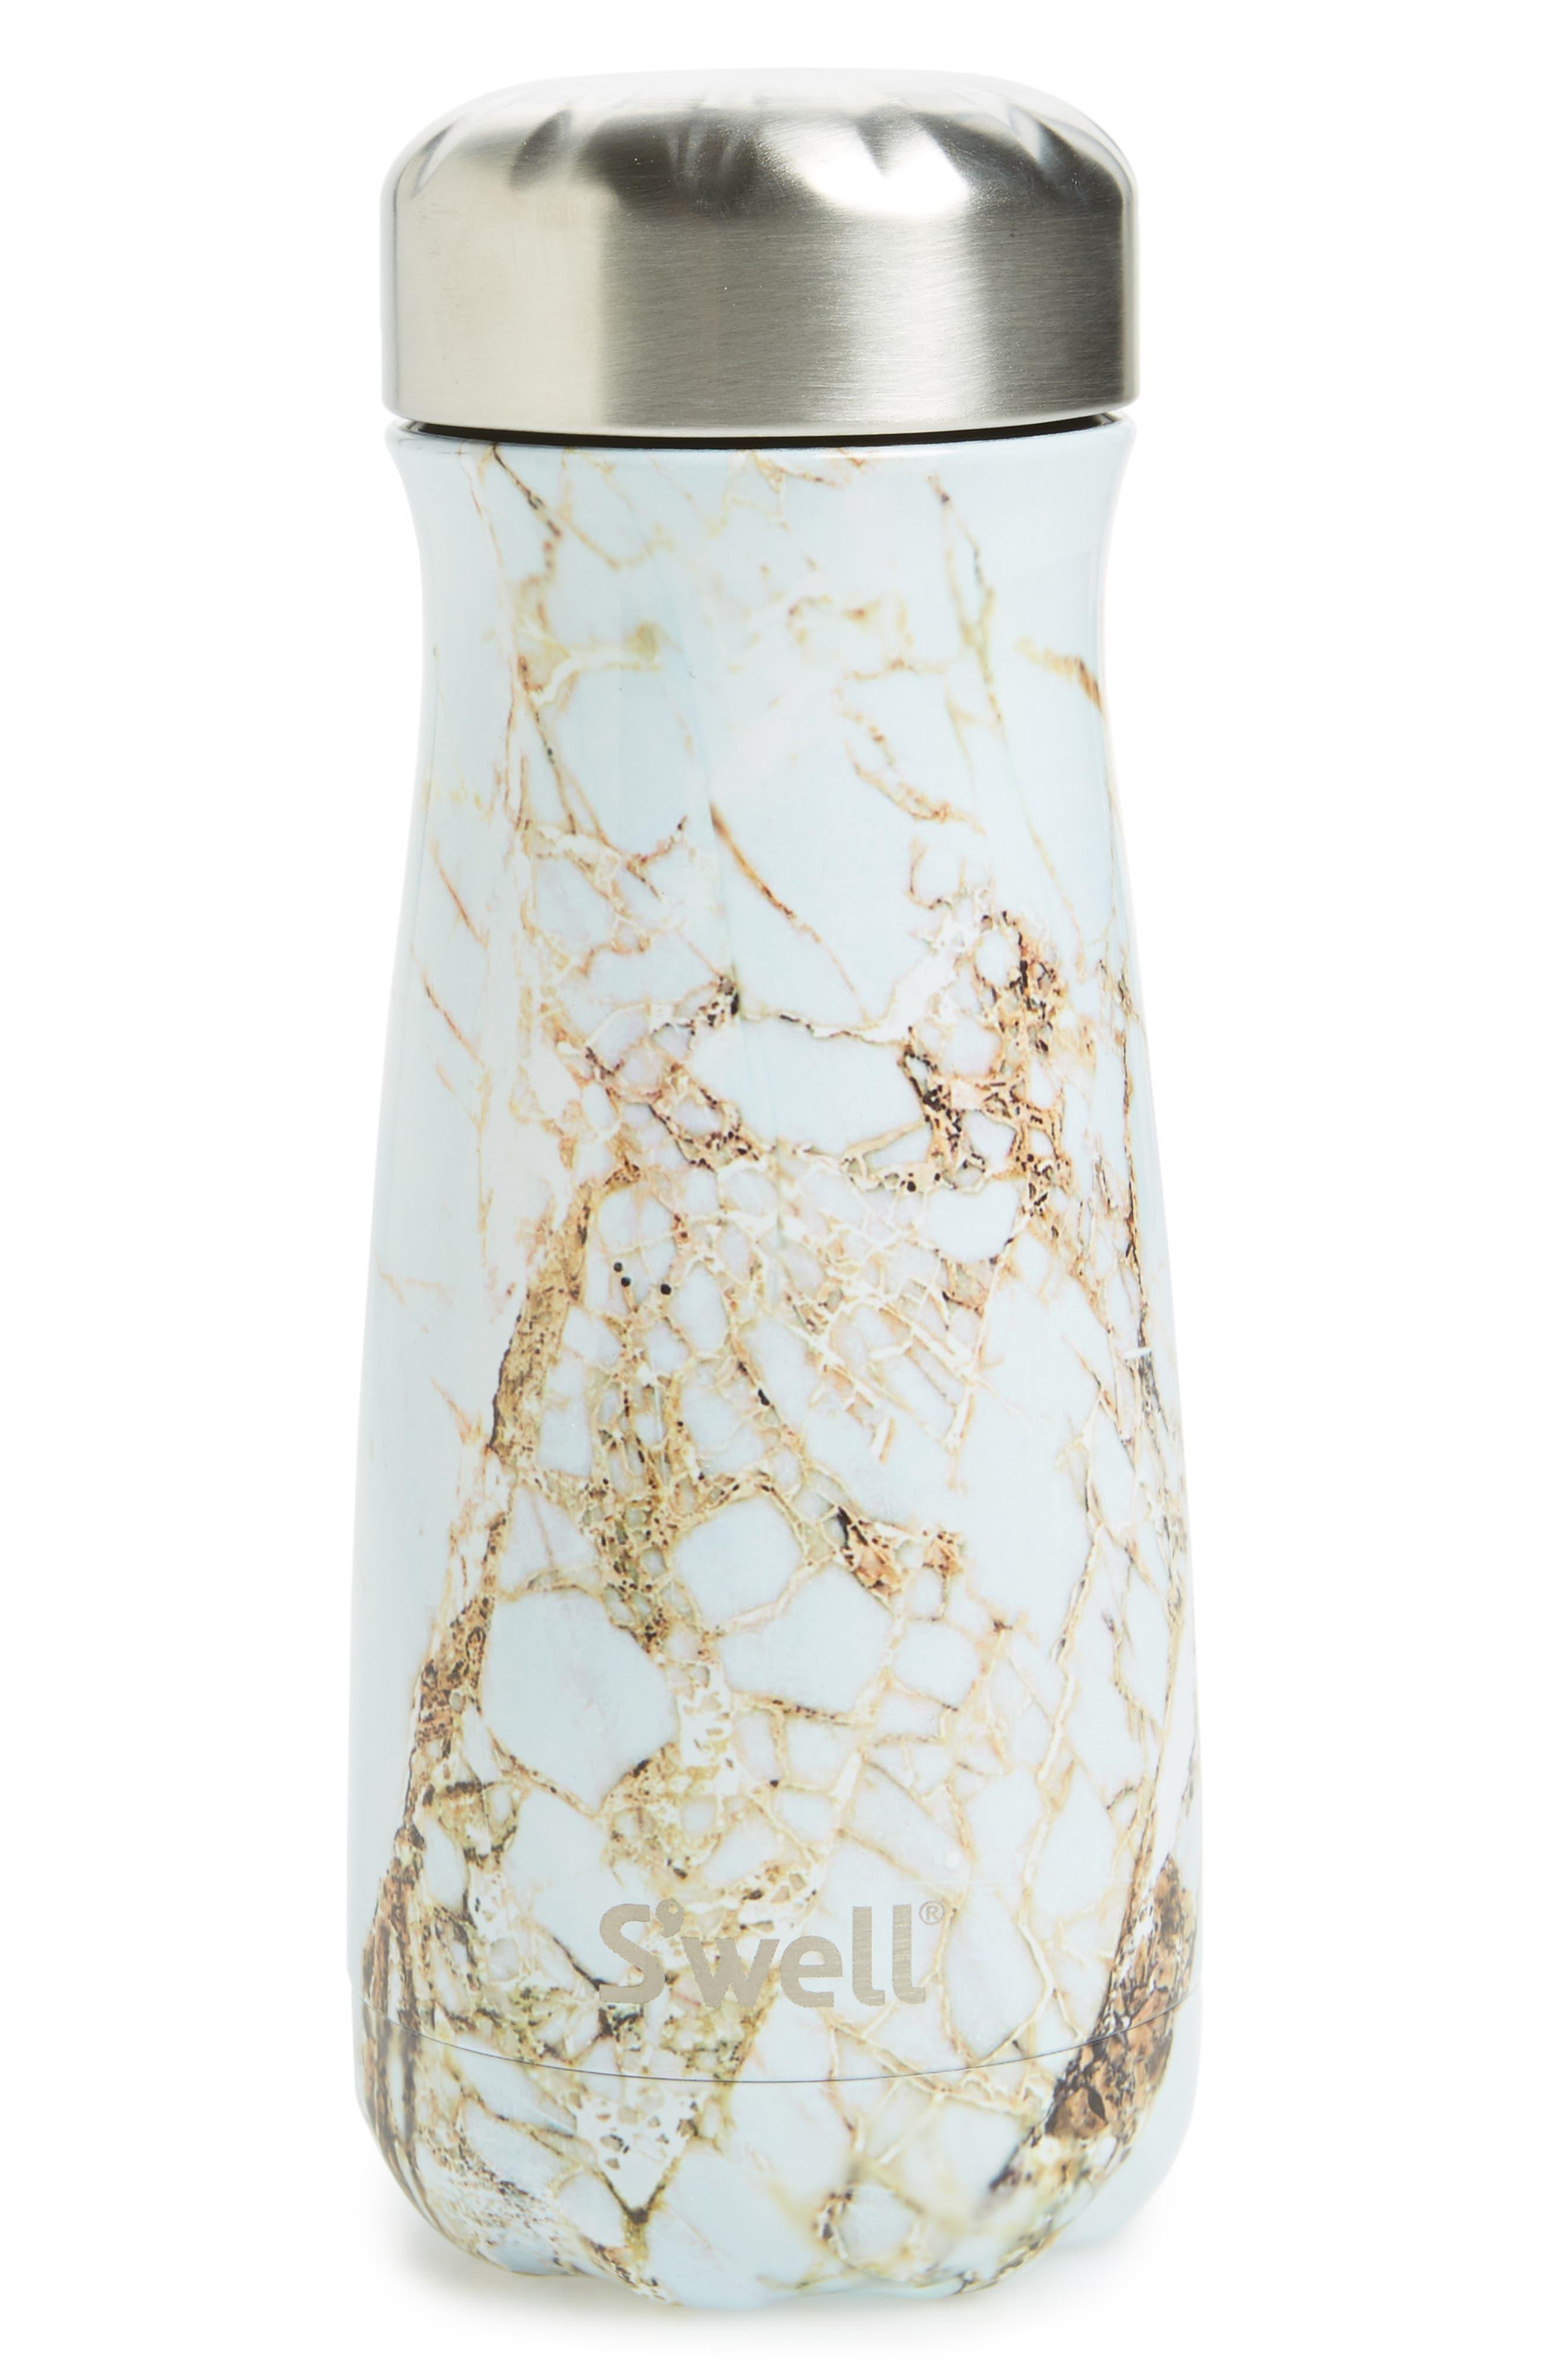 S'well Traveler Calcatta Gold Insulated Stainless Steel Water Bottle